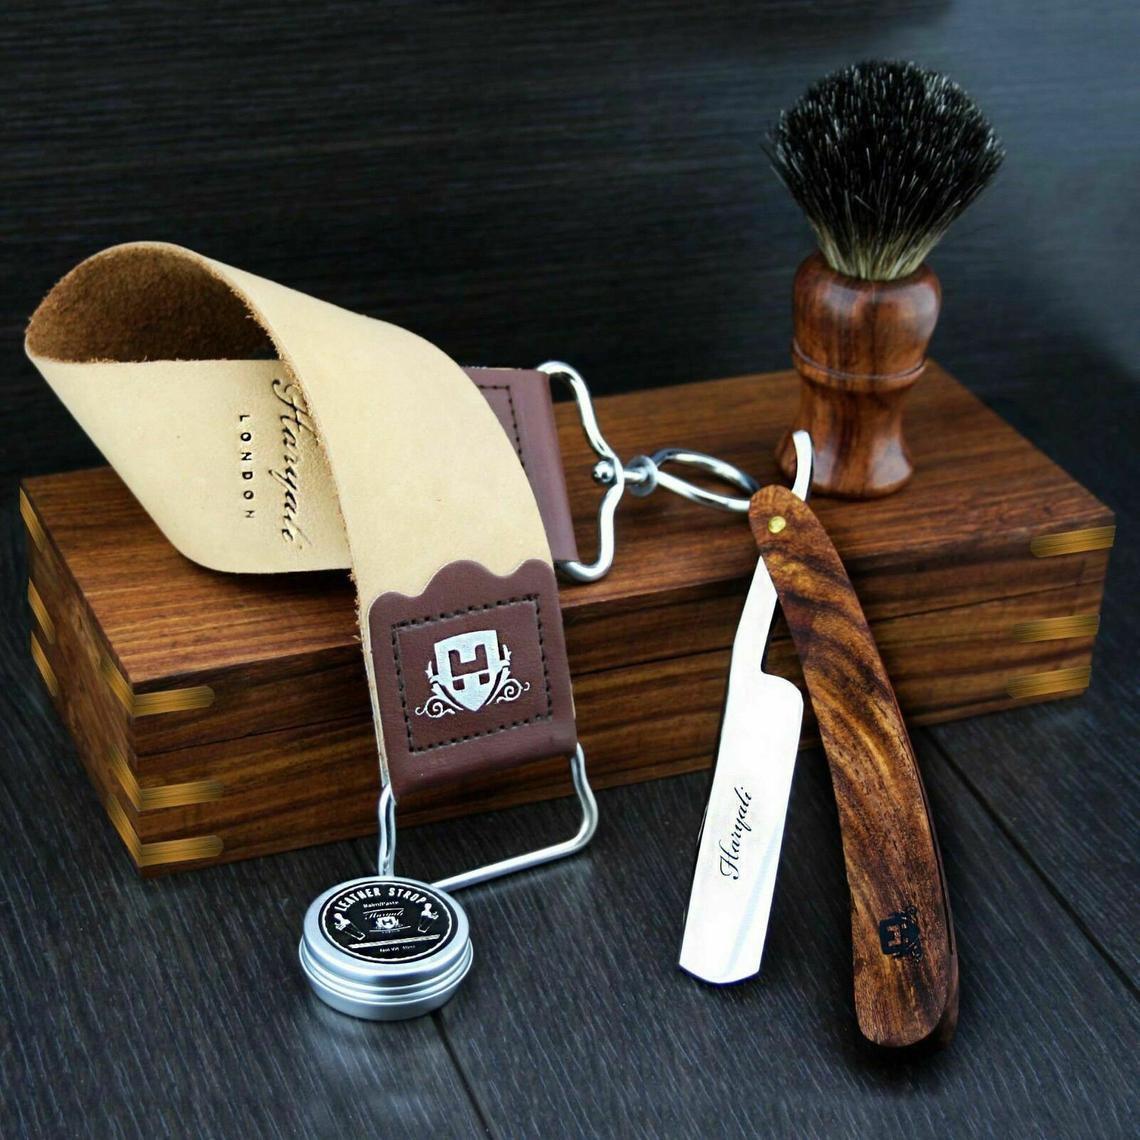 Vintage Barber Salon Cut Throat Razor Set 5 Pieces Luxury Shaving Set For Men Perfect Gift